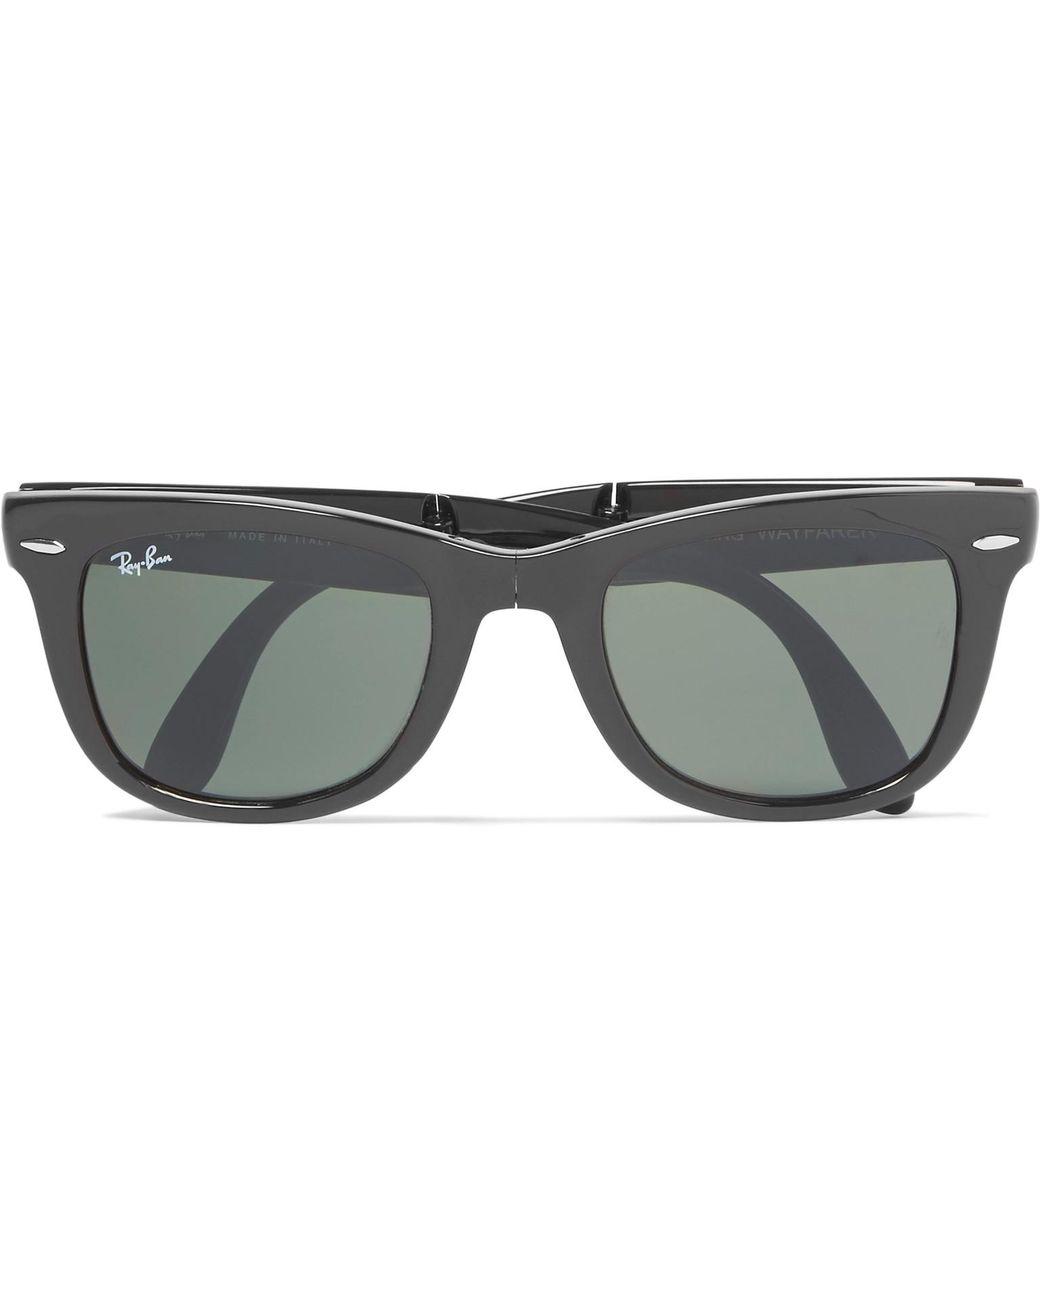 b93b2f78bbe0b Ray-Ban Wayfarer Folding Acetate Sunglasses in Black for Men - Lyst